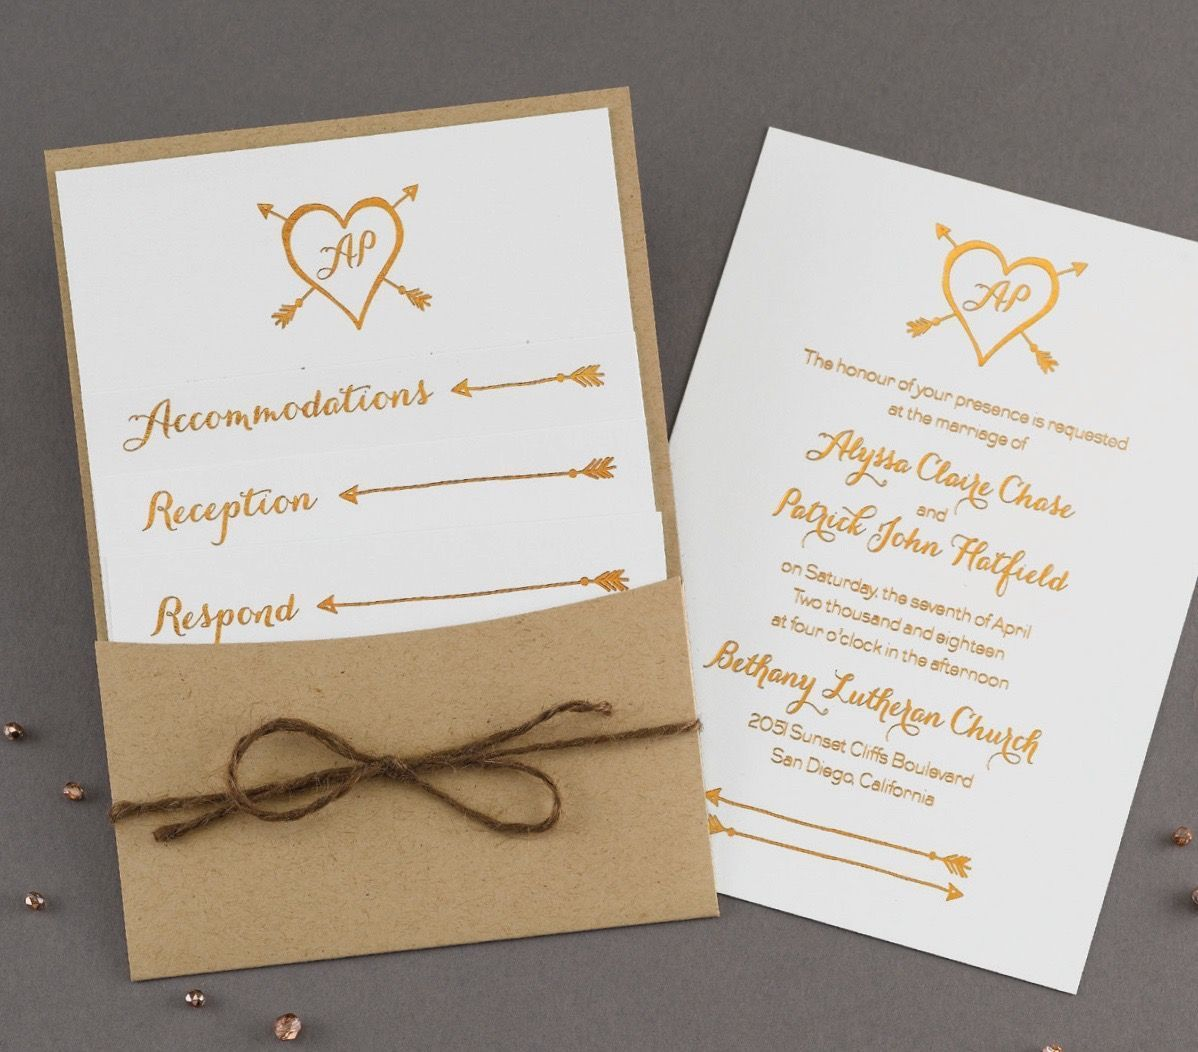 Cincinnati Wedding Invitations - Reviews for 44 Invitations